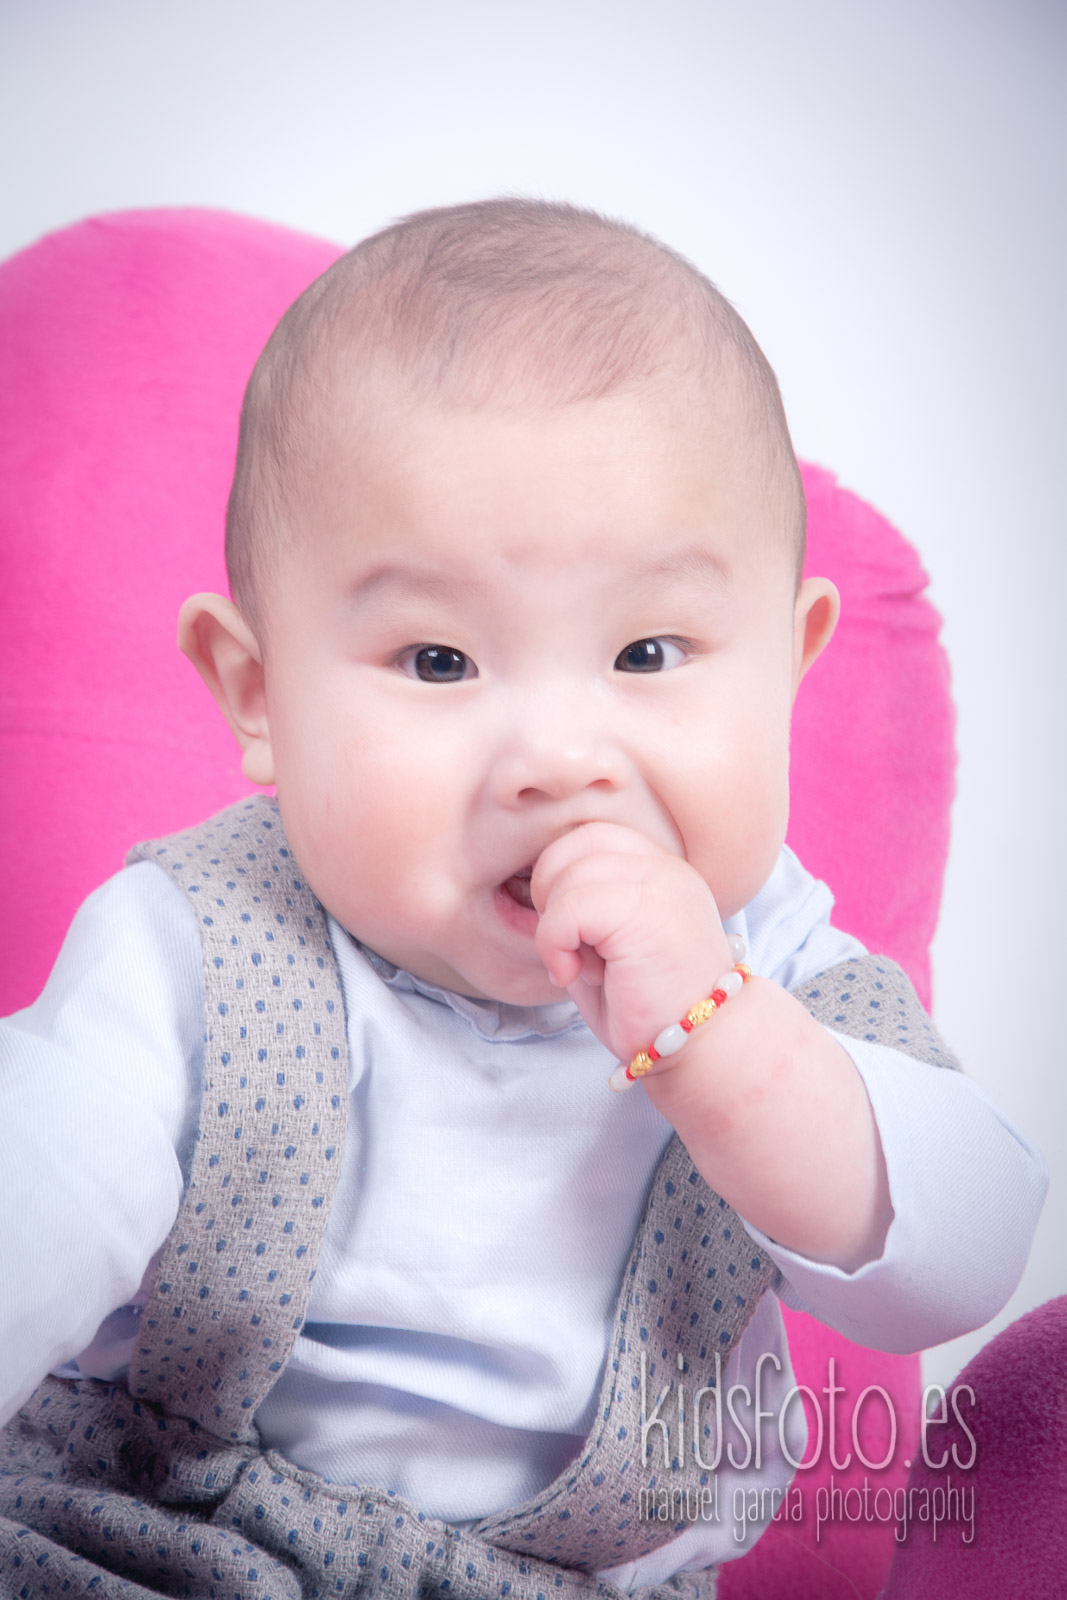 kidsfoto.es Sesión fotográfica bebé 6 meses, fotógrafo bebé Zaragoza